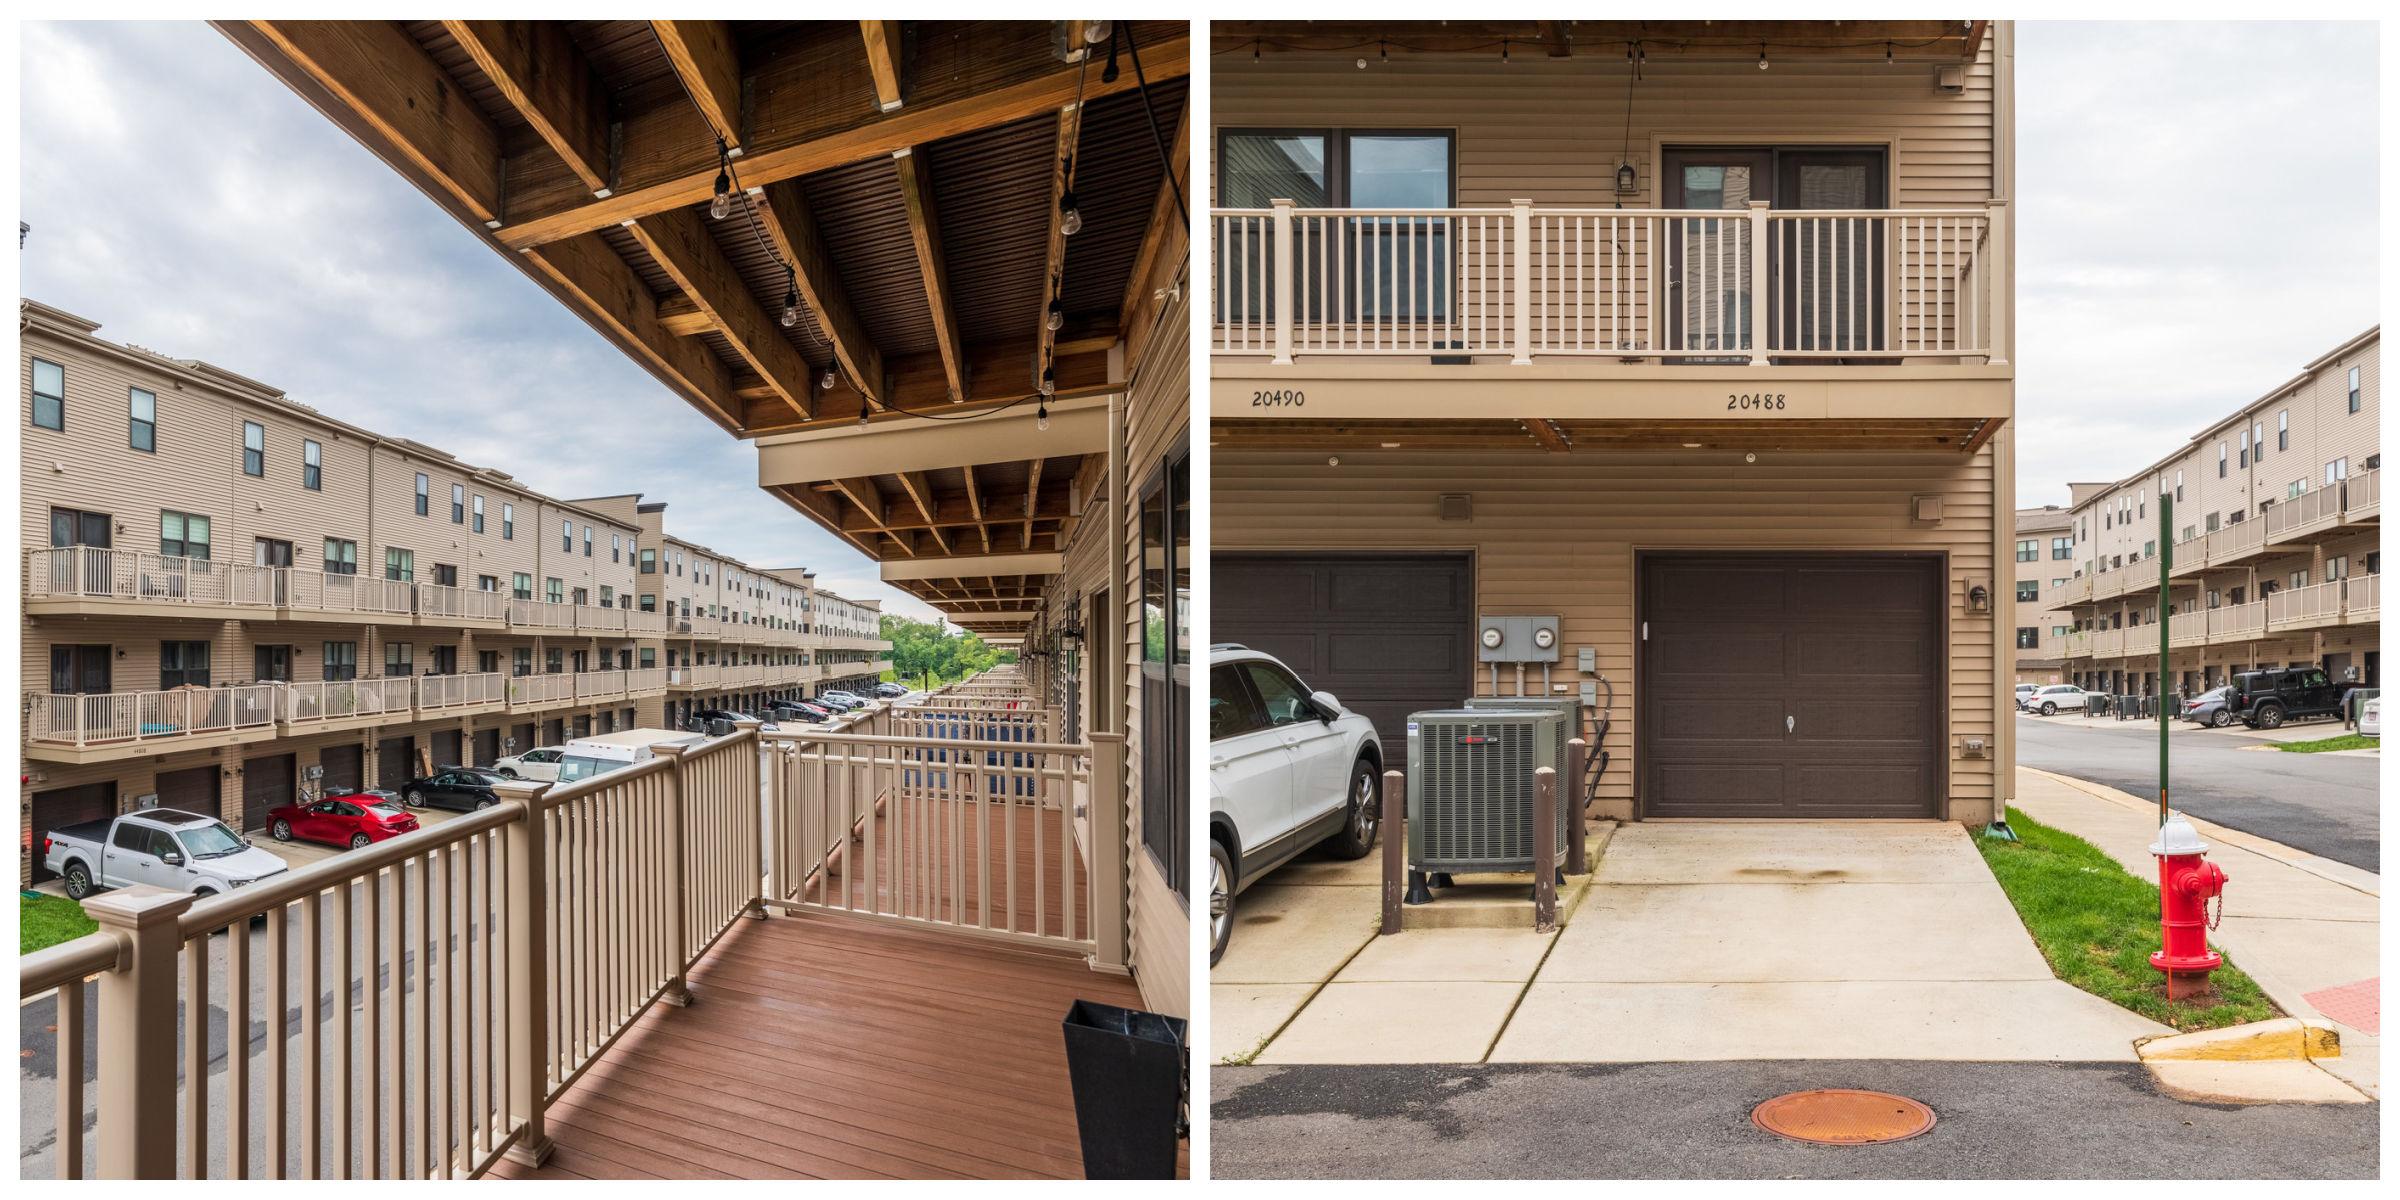 20488 Milbridge Ter, Ashburn- Balcony and Garage